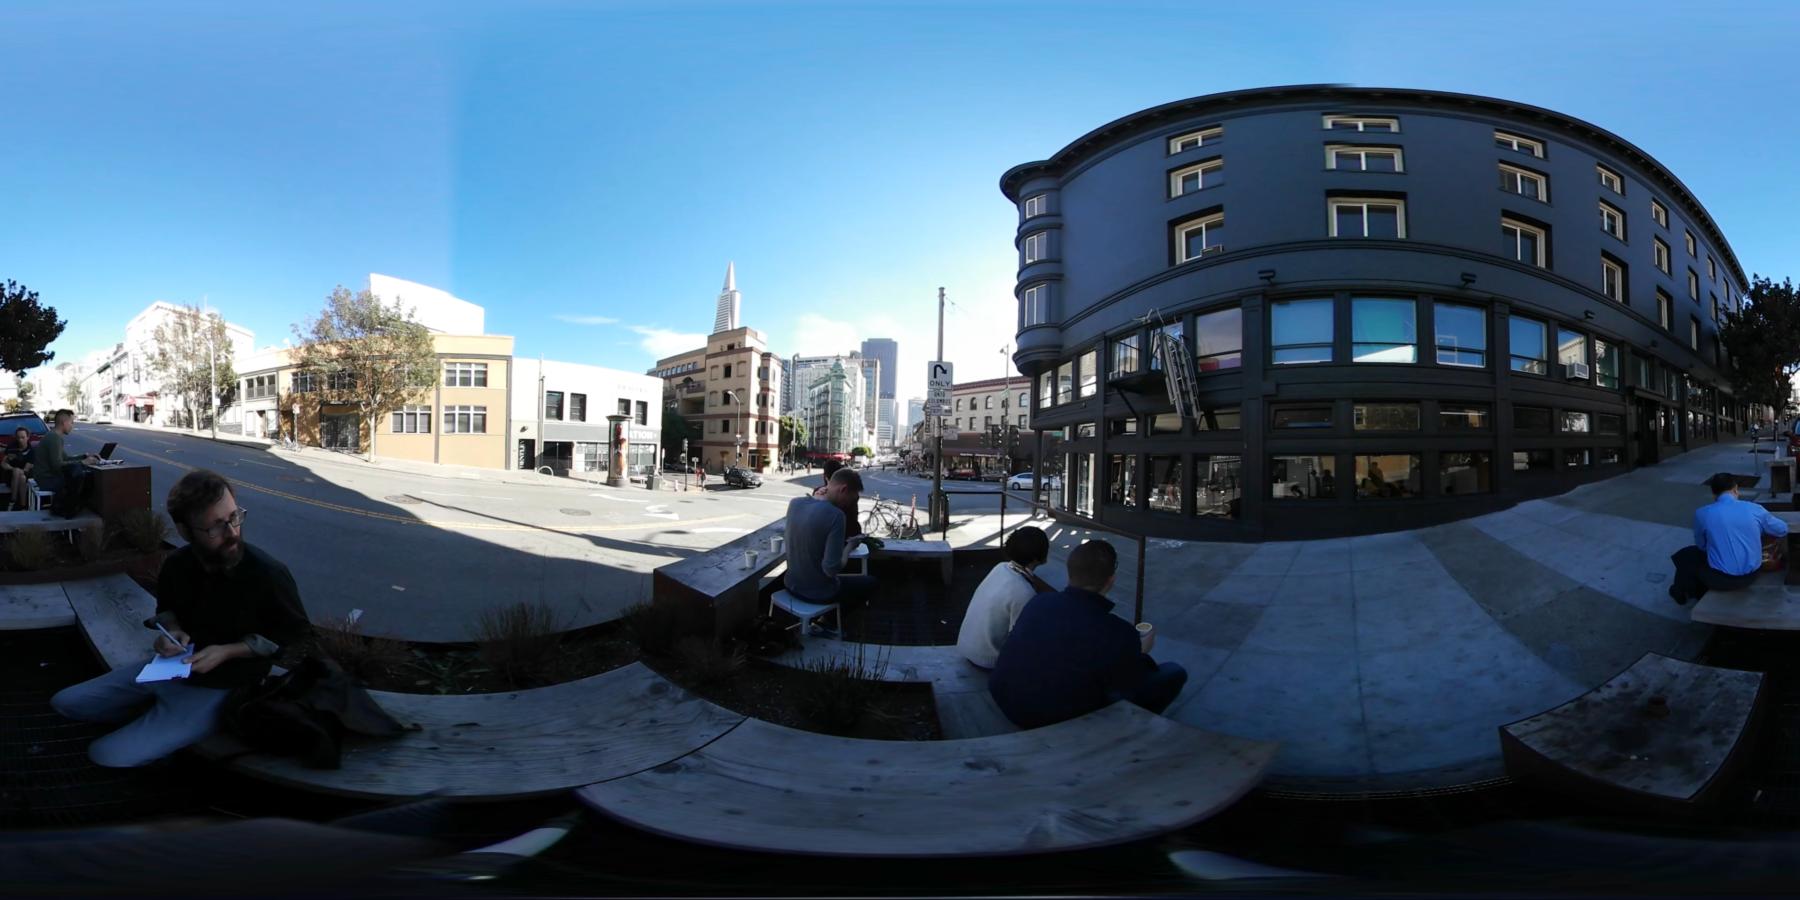 Réveille Coffee Parklet - 360° video still frame